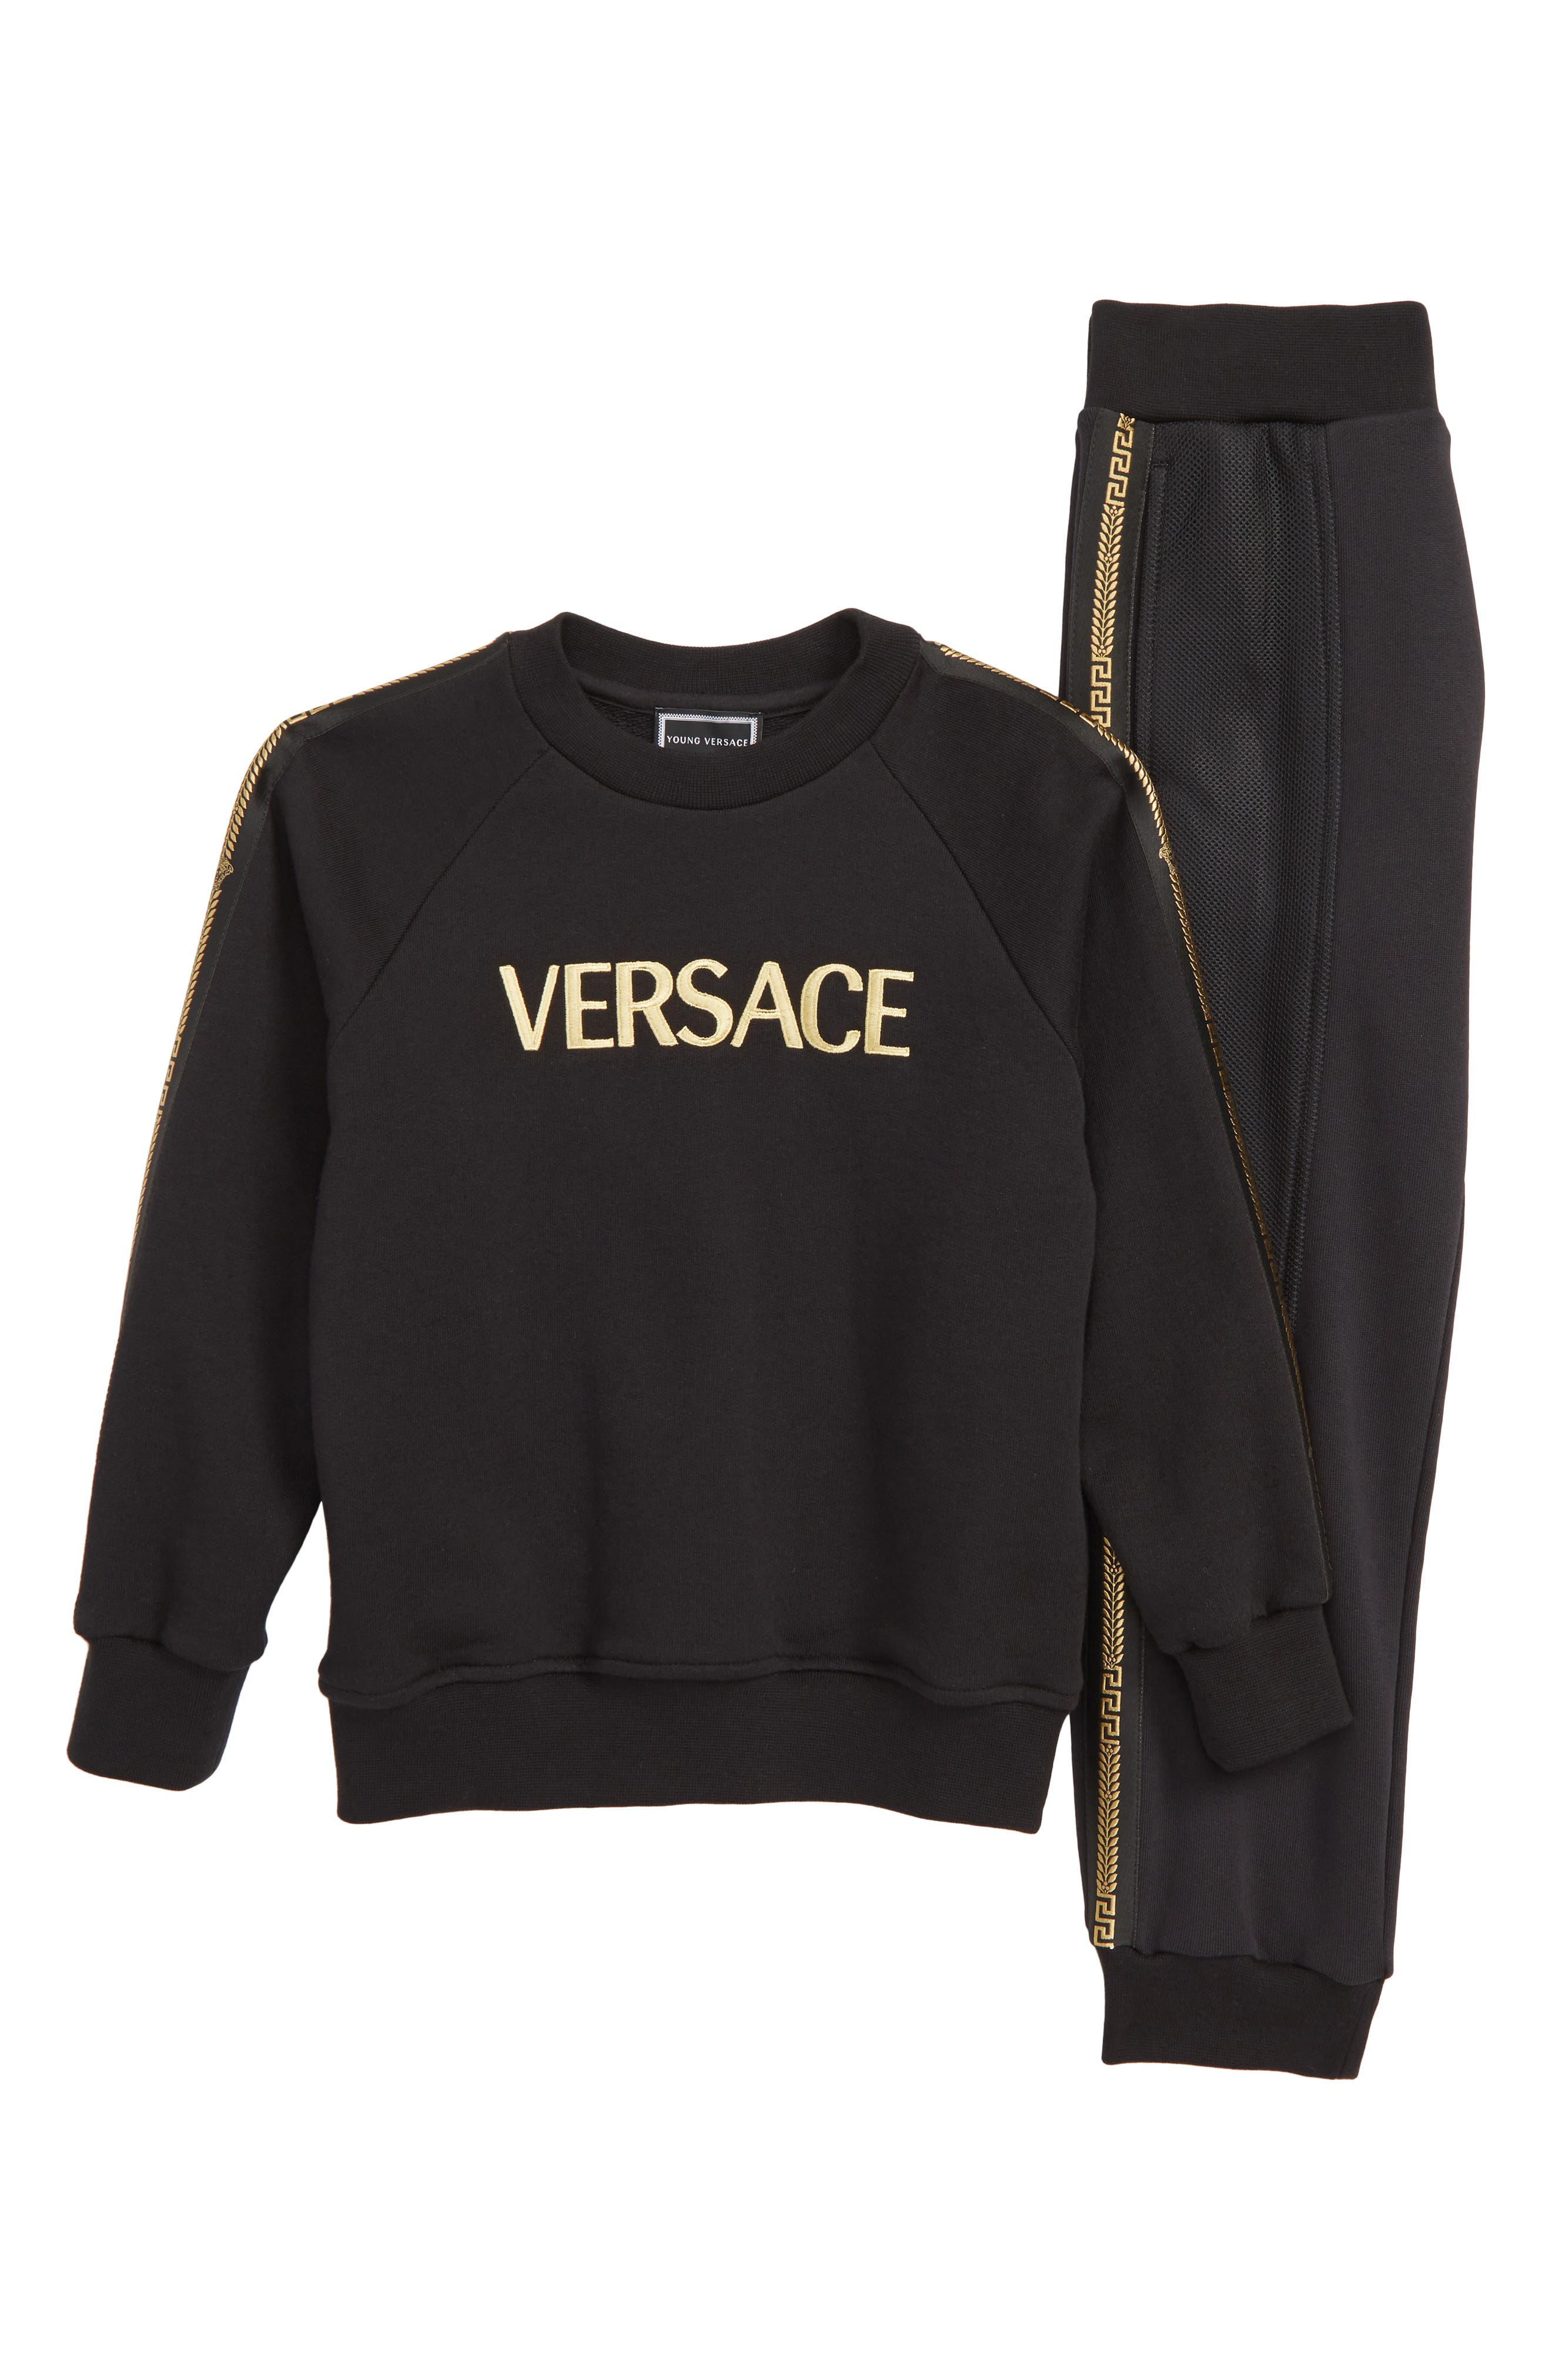 Boys Versace Logo Sweatshirt  Sweatpants Set